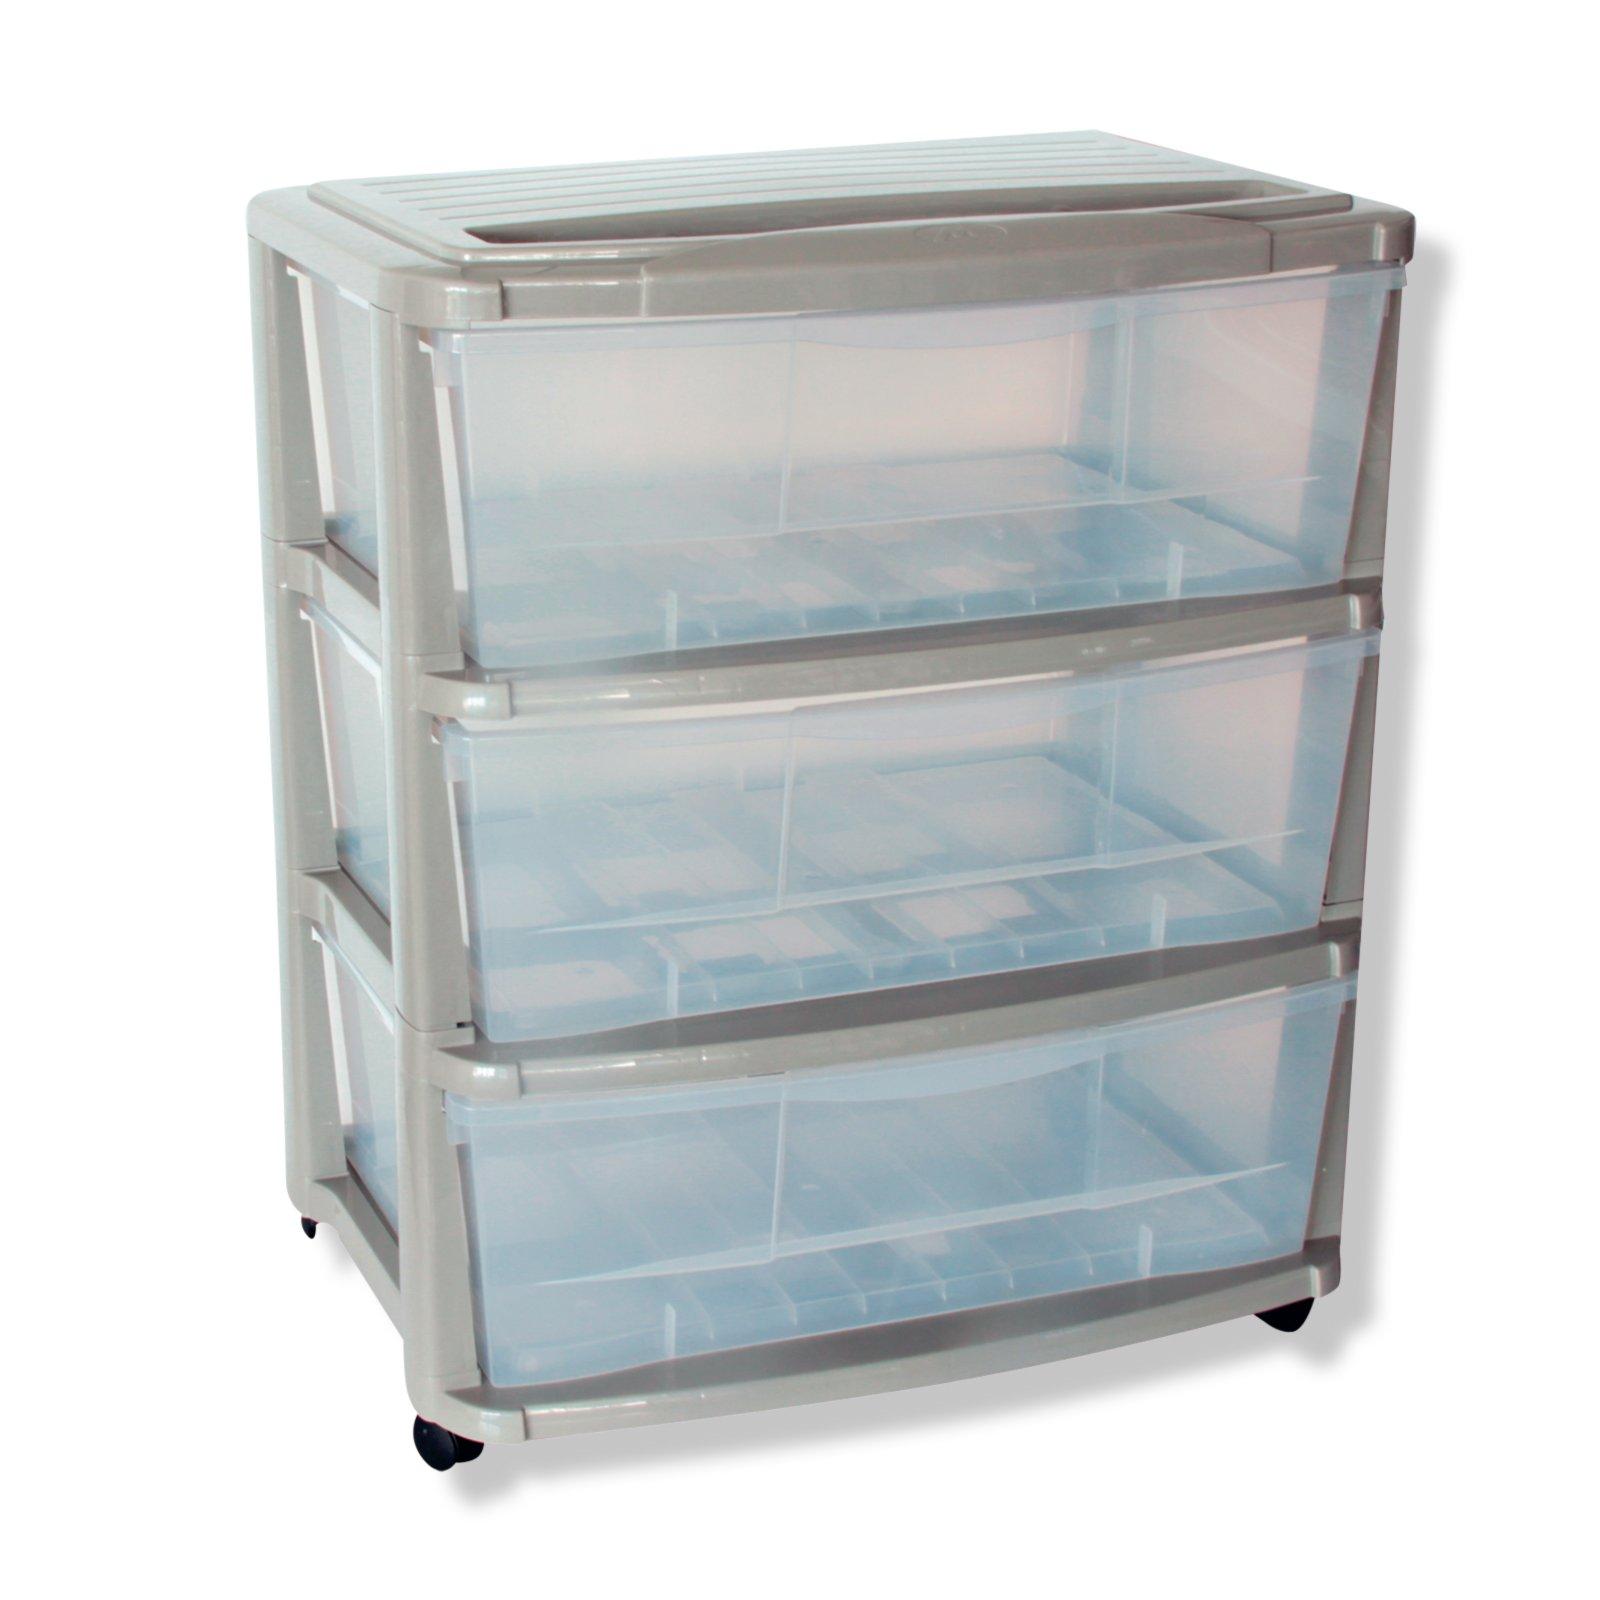 aufbewahrungsboxen turm grau breite 55 5 cm rollcontainer m bel m belhaus roller. Black Bedroom Furniture Sets. Home Design Ideas